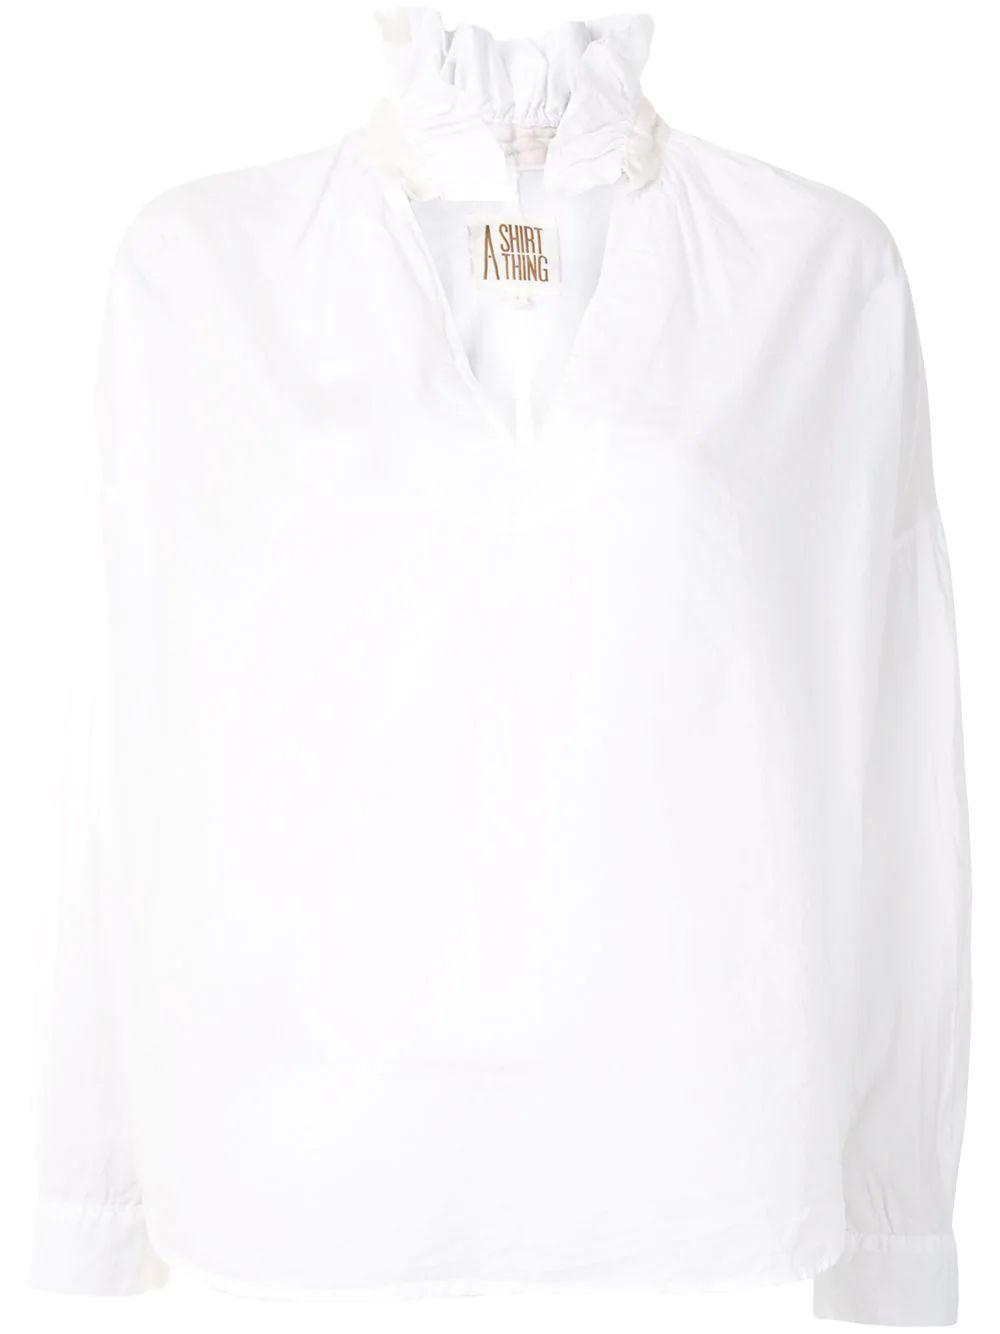 Penelope Cabo Shirt Item # 706-TP10188-20A